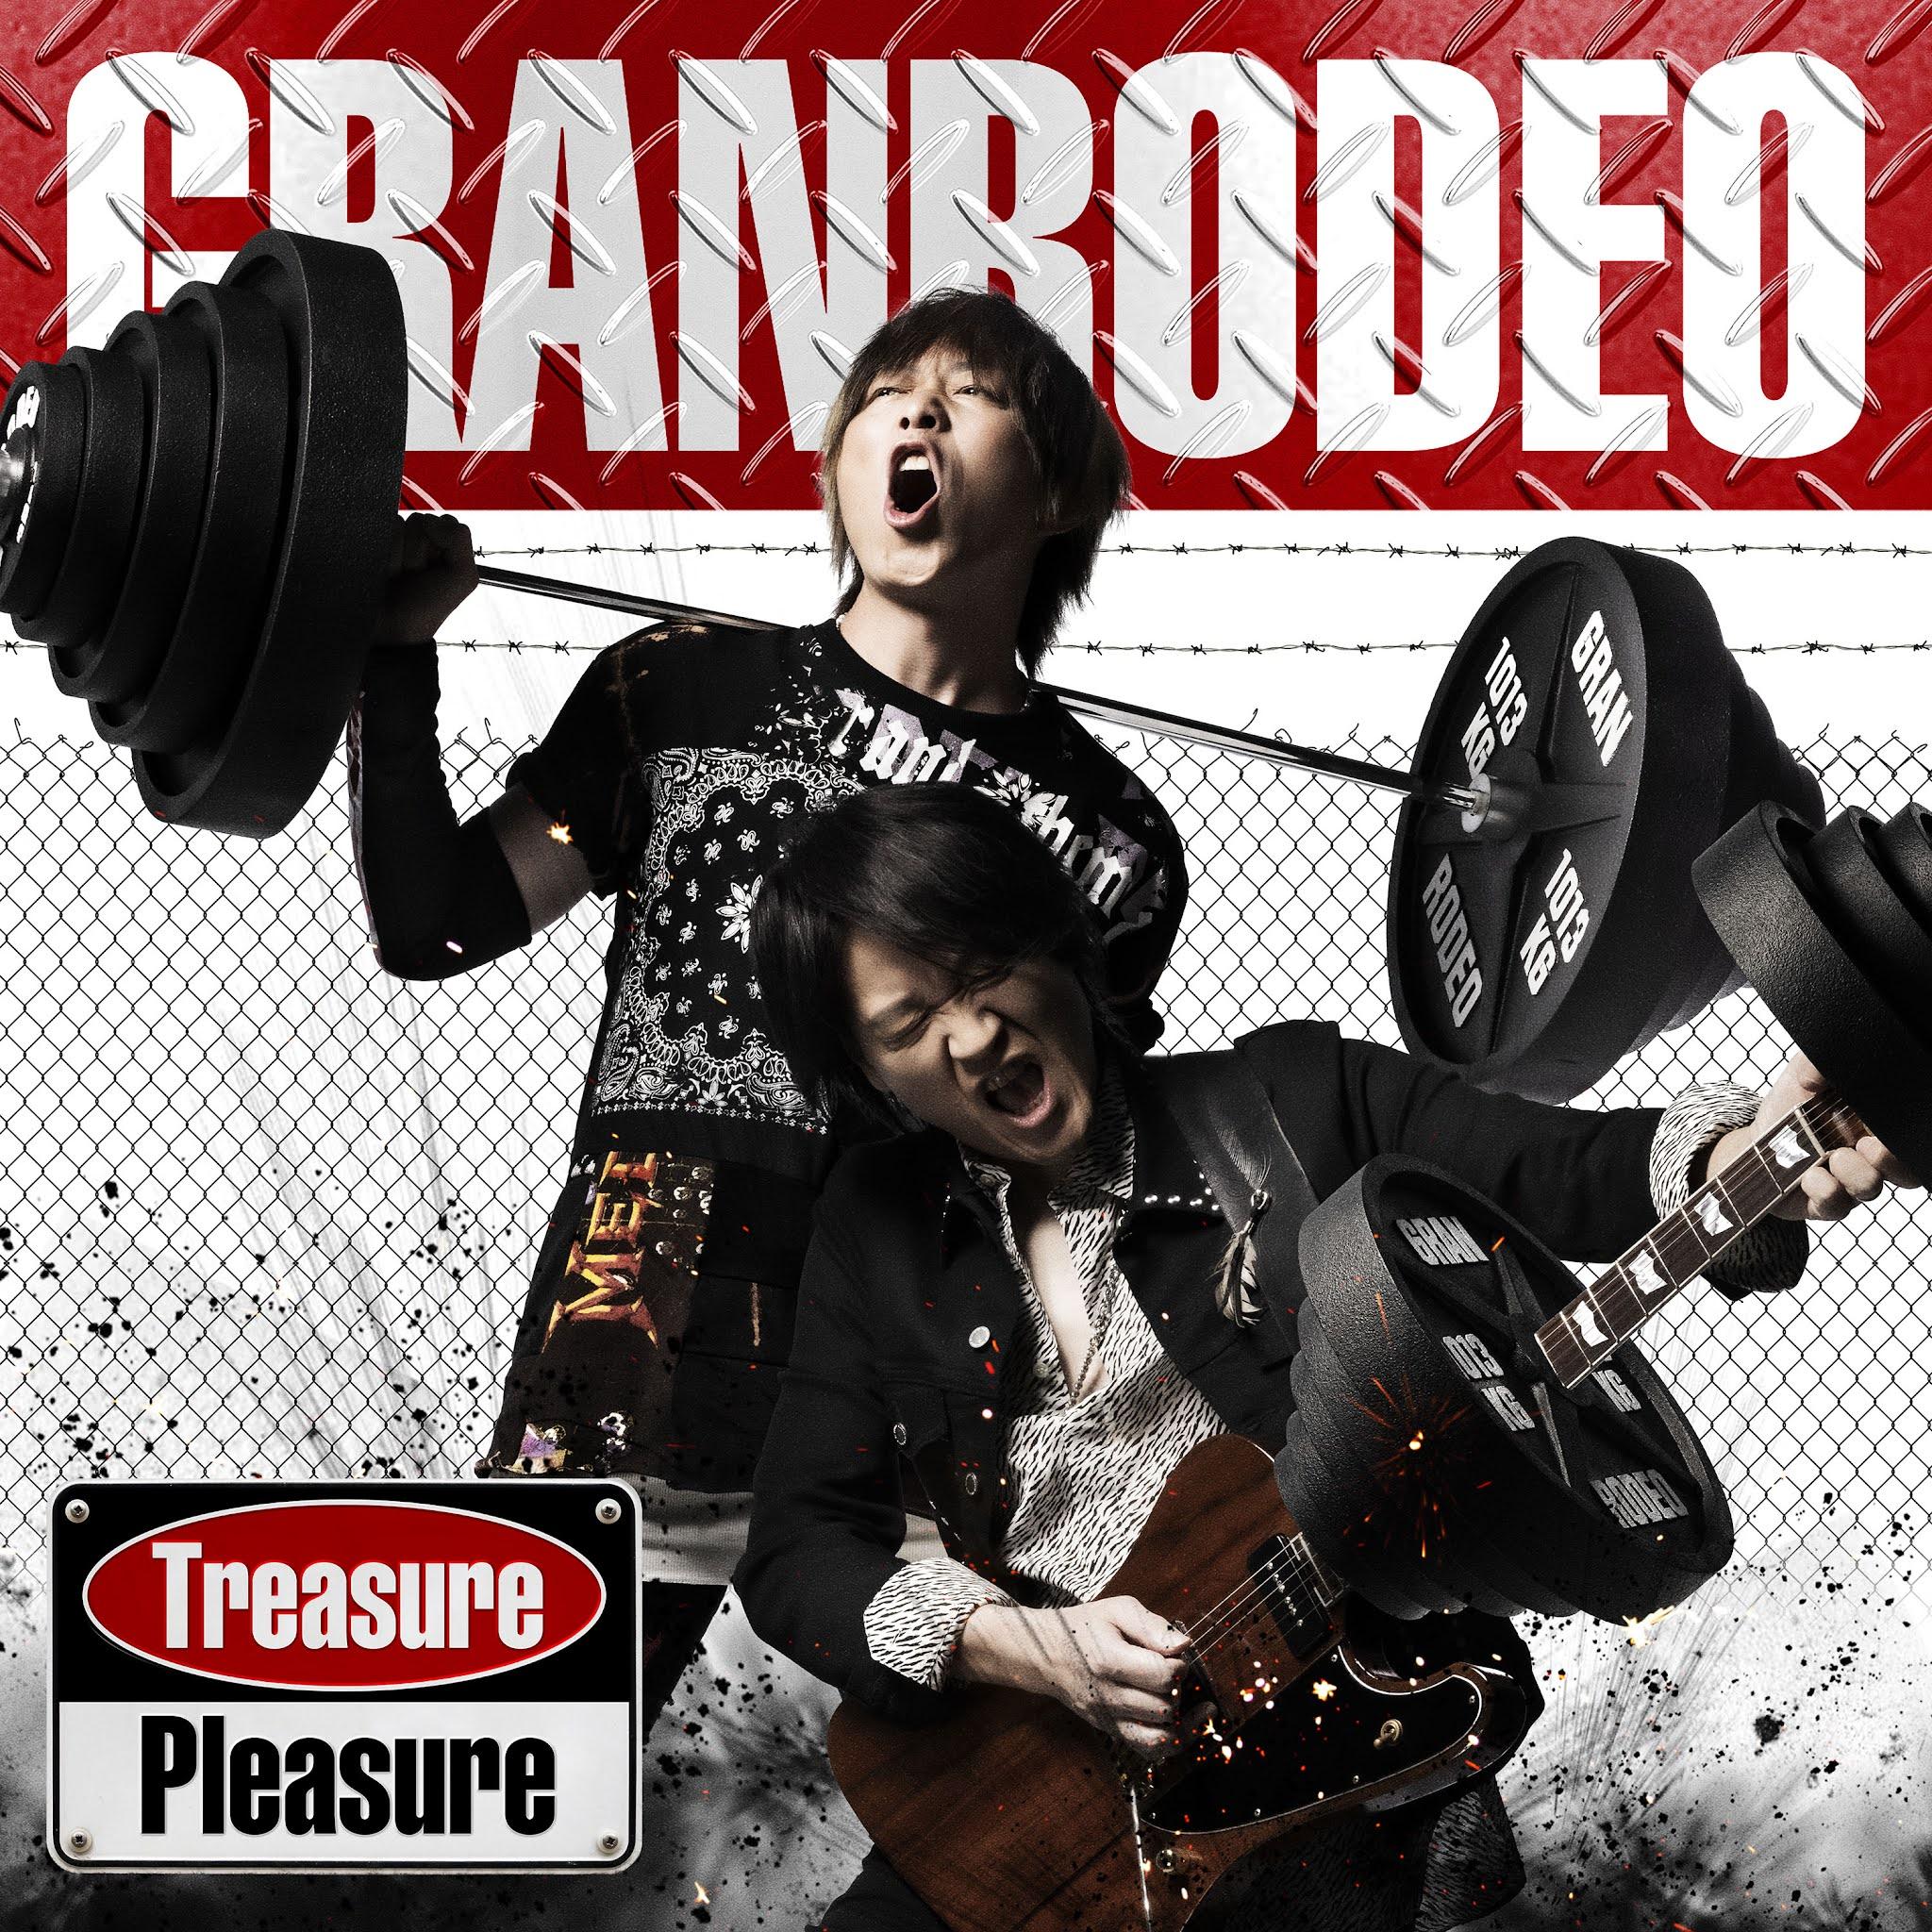 GRANRODEO - Treasure Pleasure